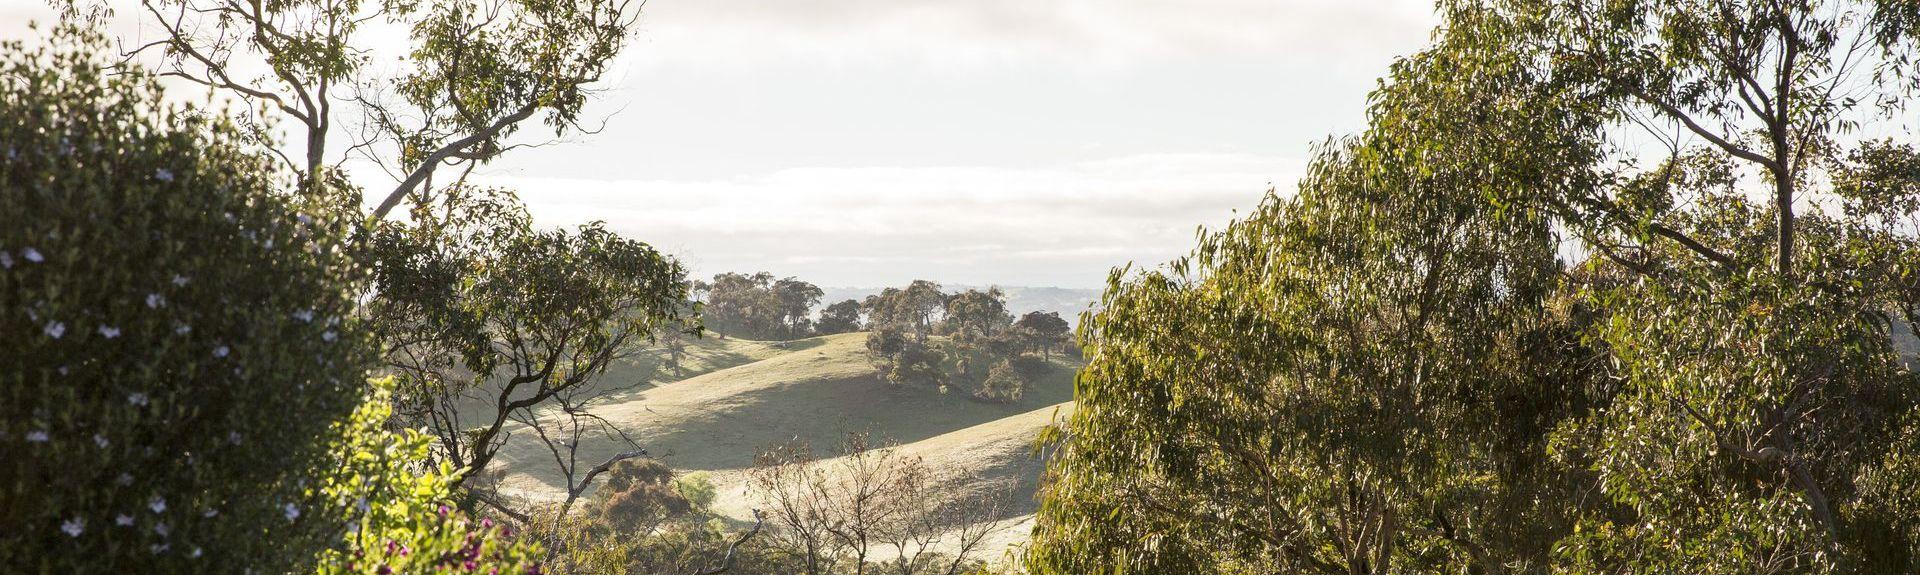 Chewton VIC, Australia